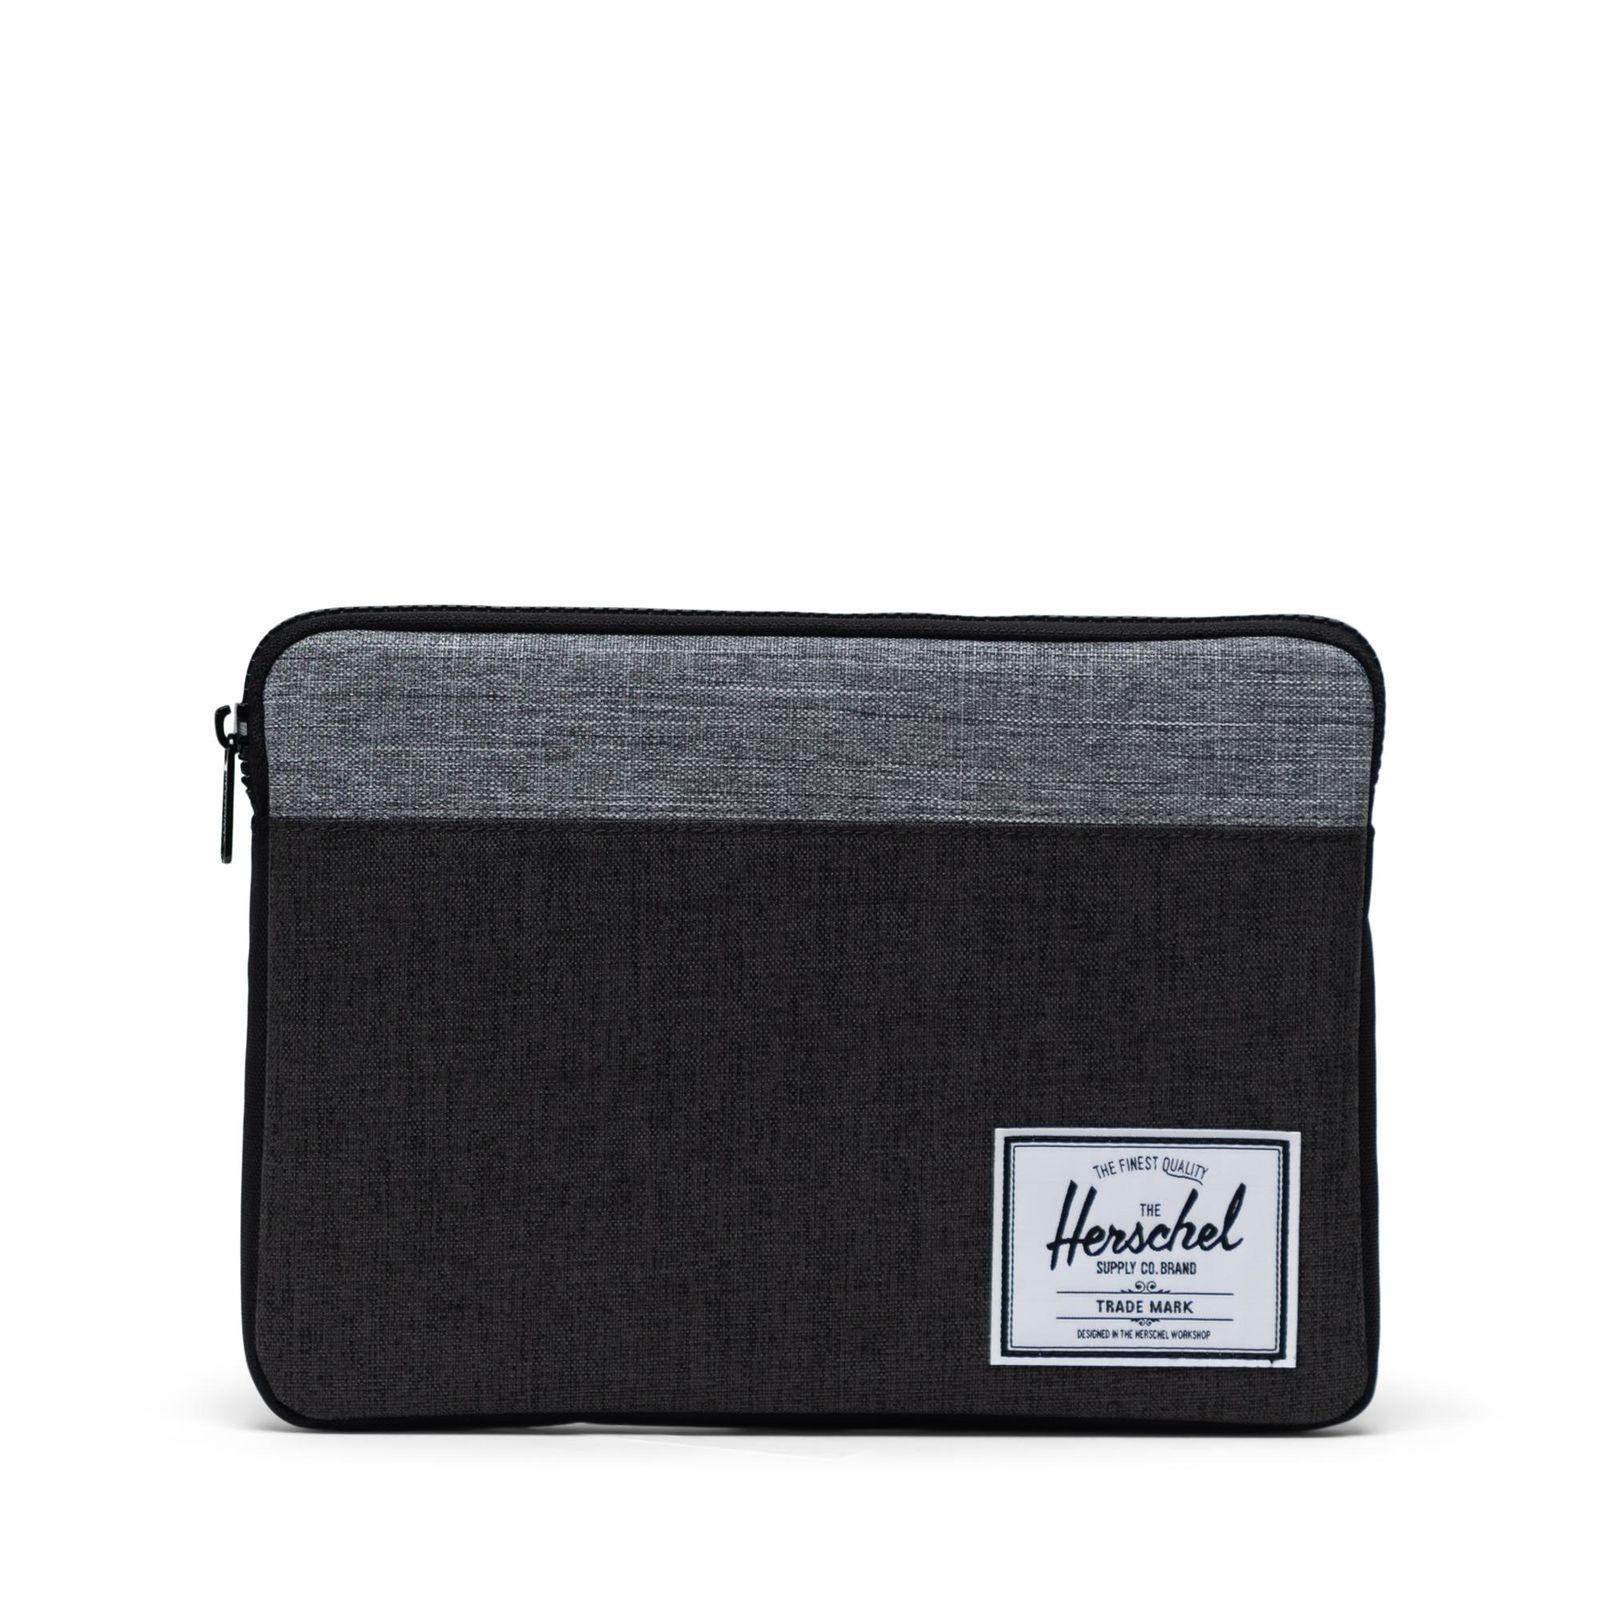 Herschel iPad Kılıfı Anchor Sleeve for iPad Air Black Crosshatch/Black/Raven Crosshatch